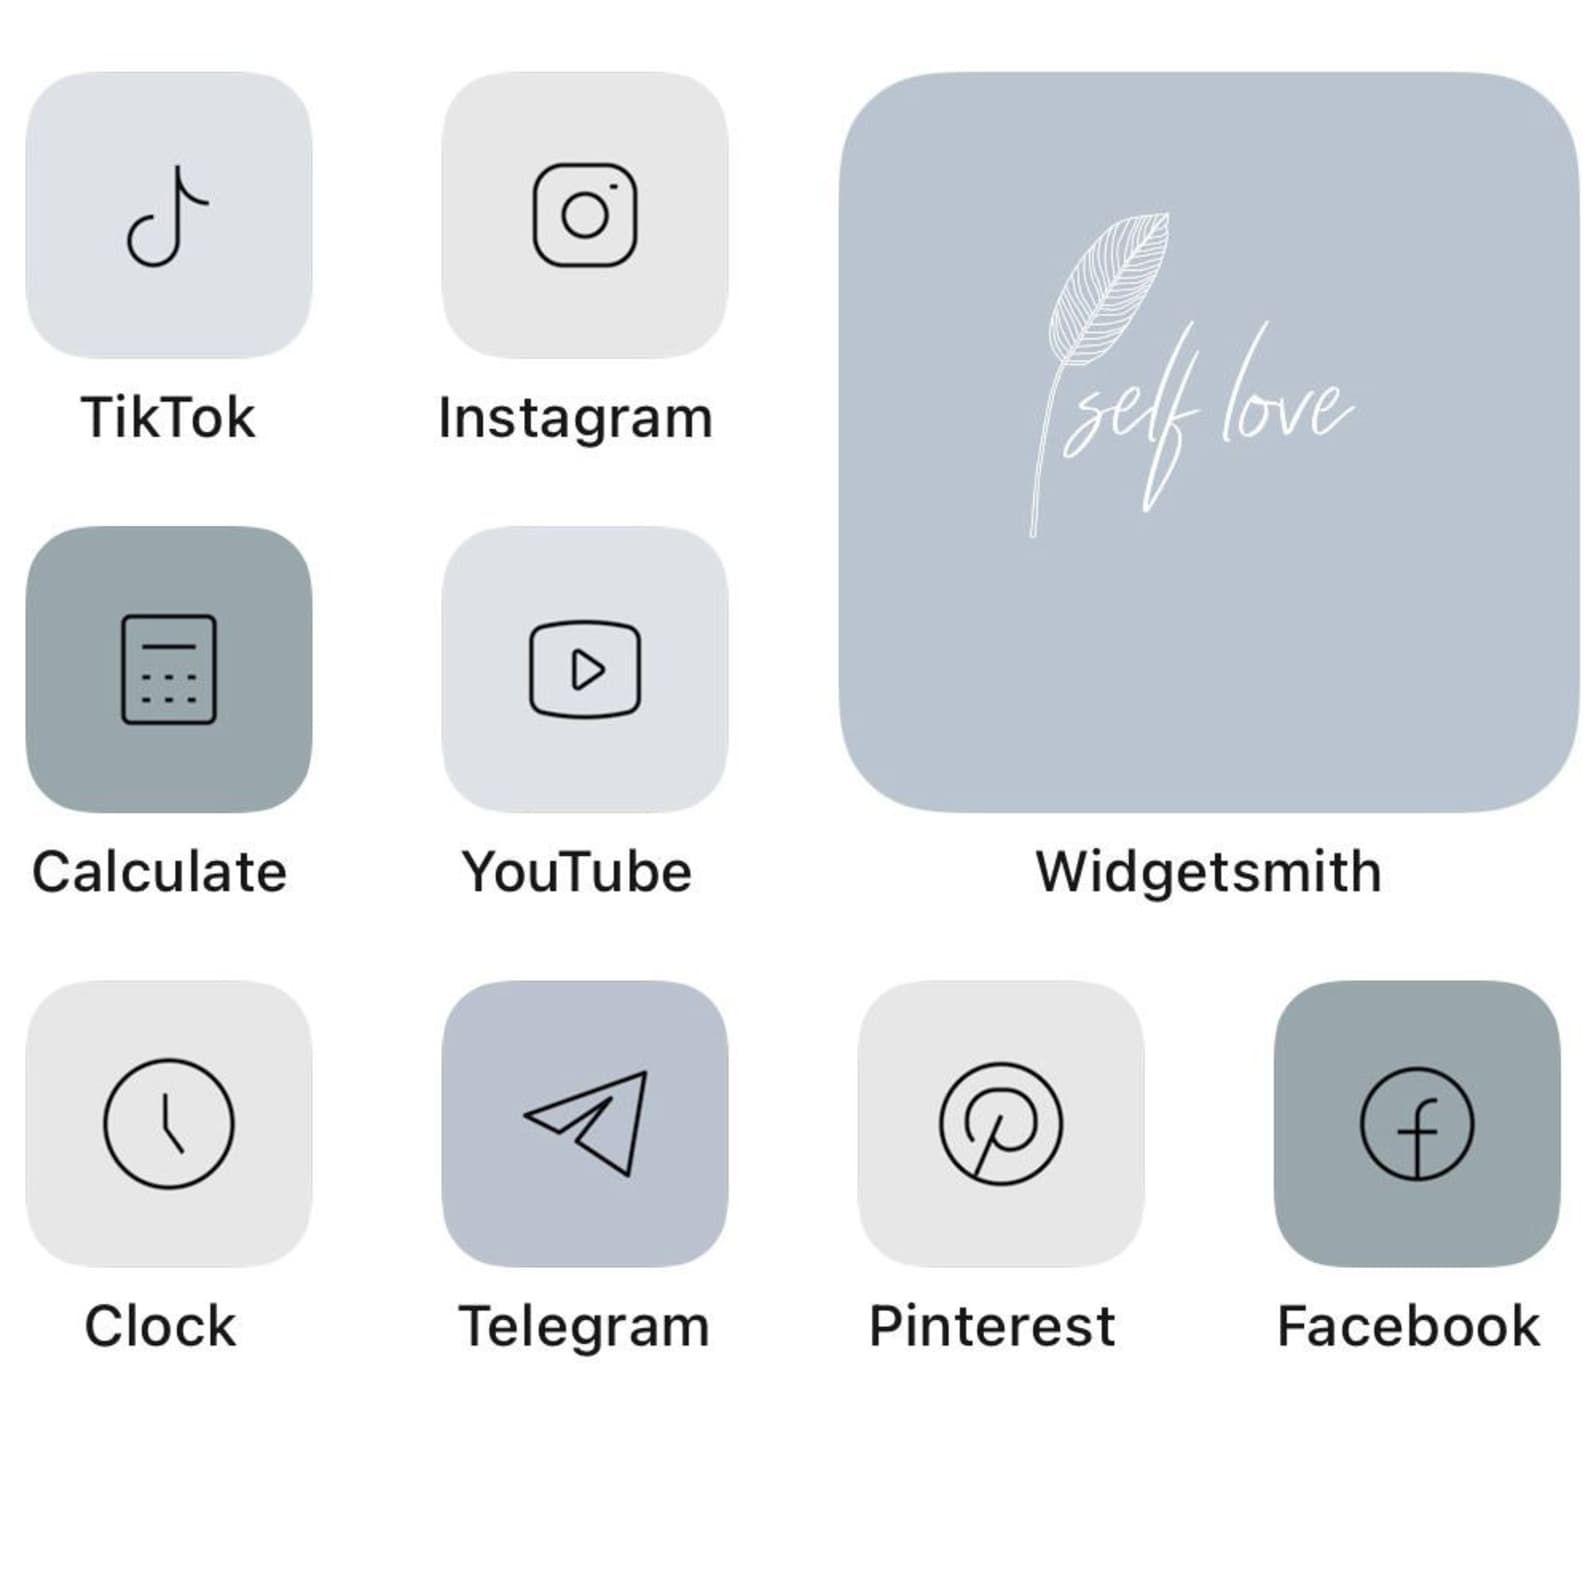 83 Grey Ios 14 App Icons Light Mood Ios14 Widget Cover Widgetsmith Aesthetic Minimal Pack Iphone Apple Icons Set Shortcut Aesthetic Grey In 2021 App Icon Apple Icon App